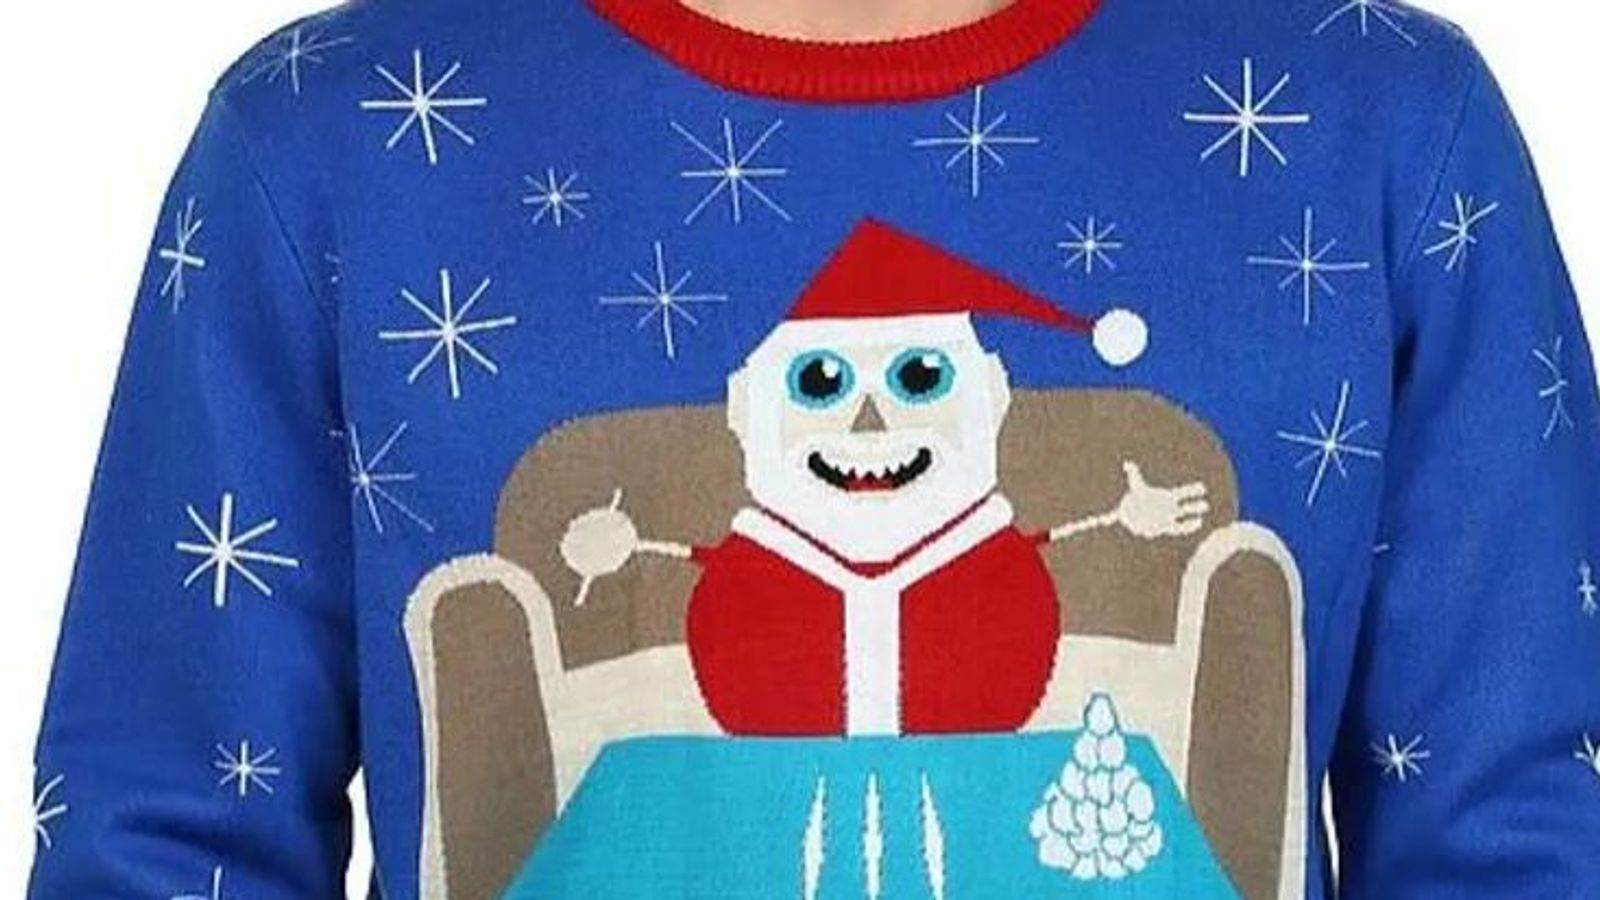 Walmart pulls jumper appearing to show Santa with lines of cocaine (09.12.19) Skynews-walmart-jumper-santa_4861547